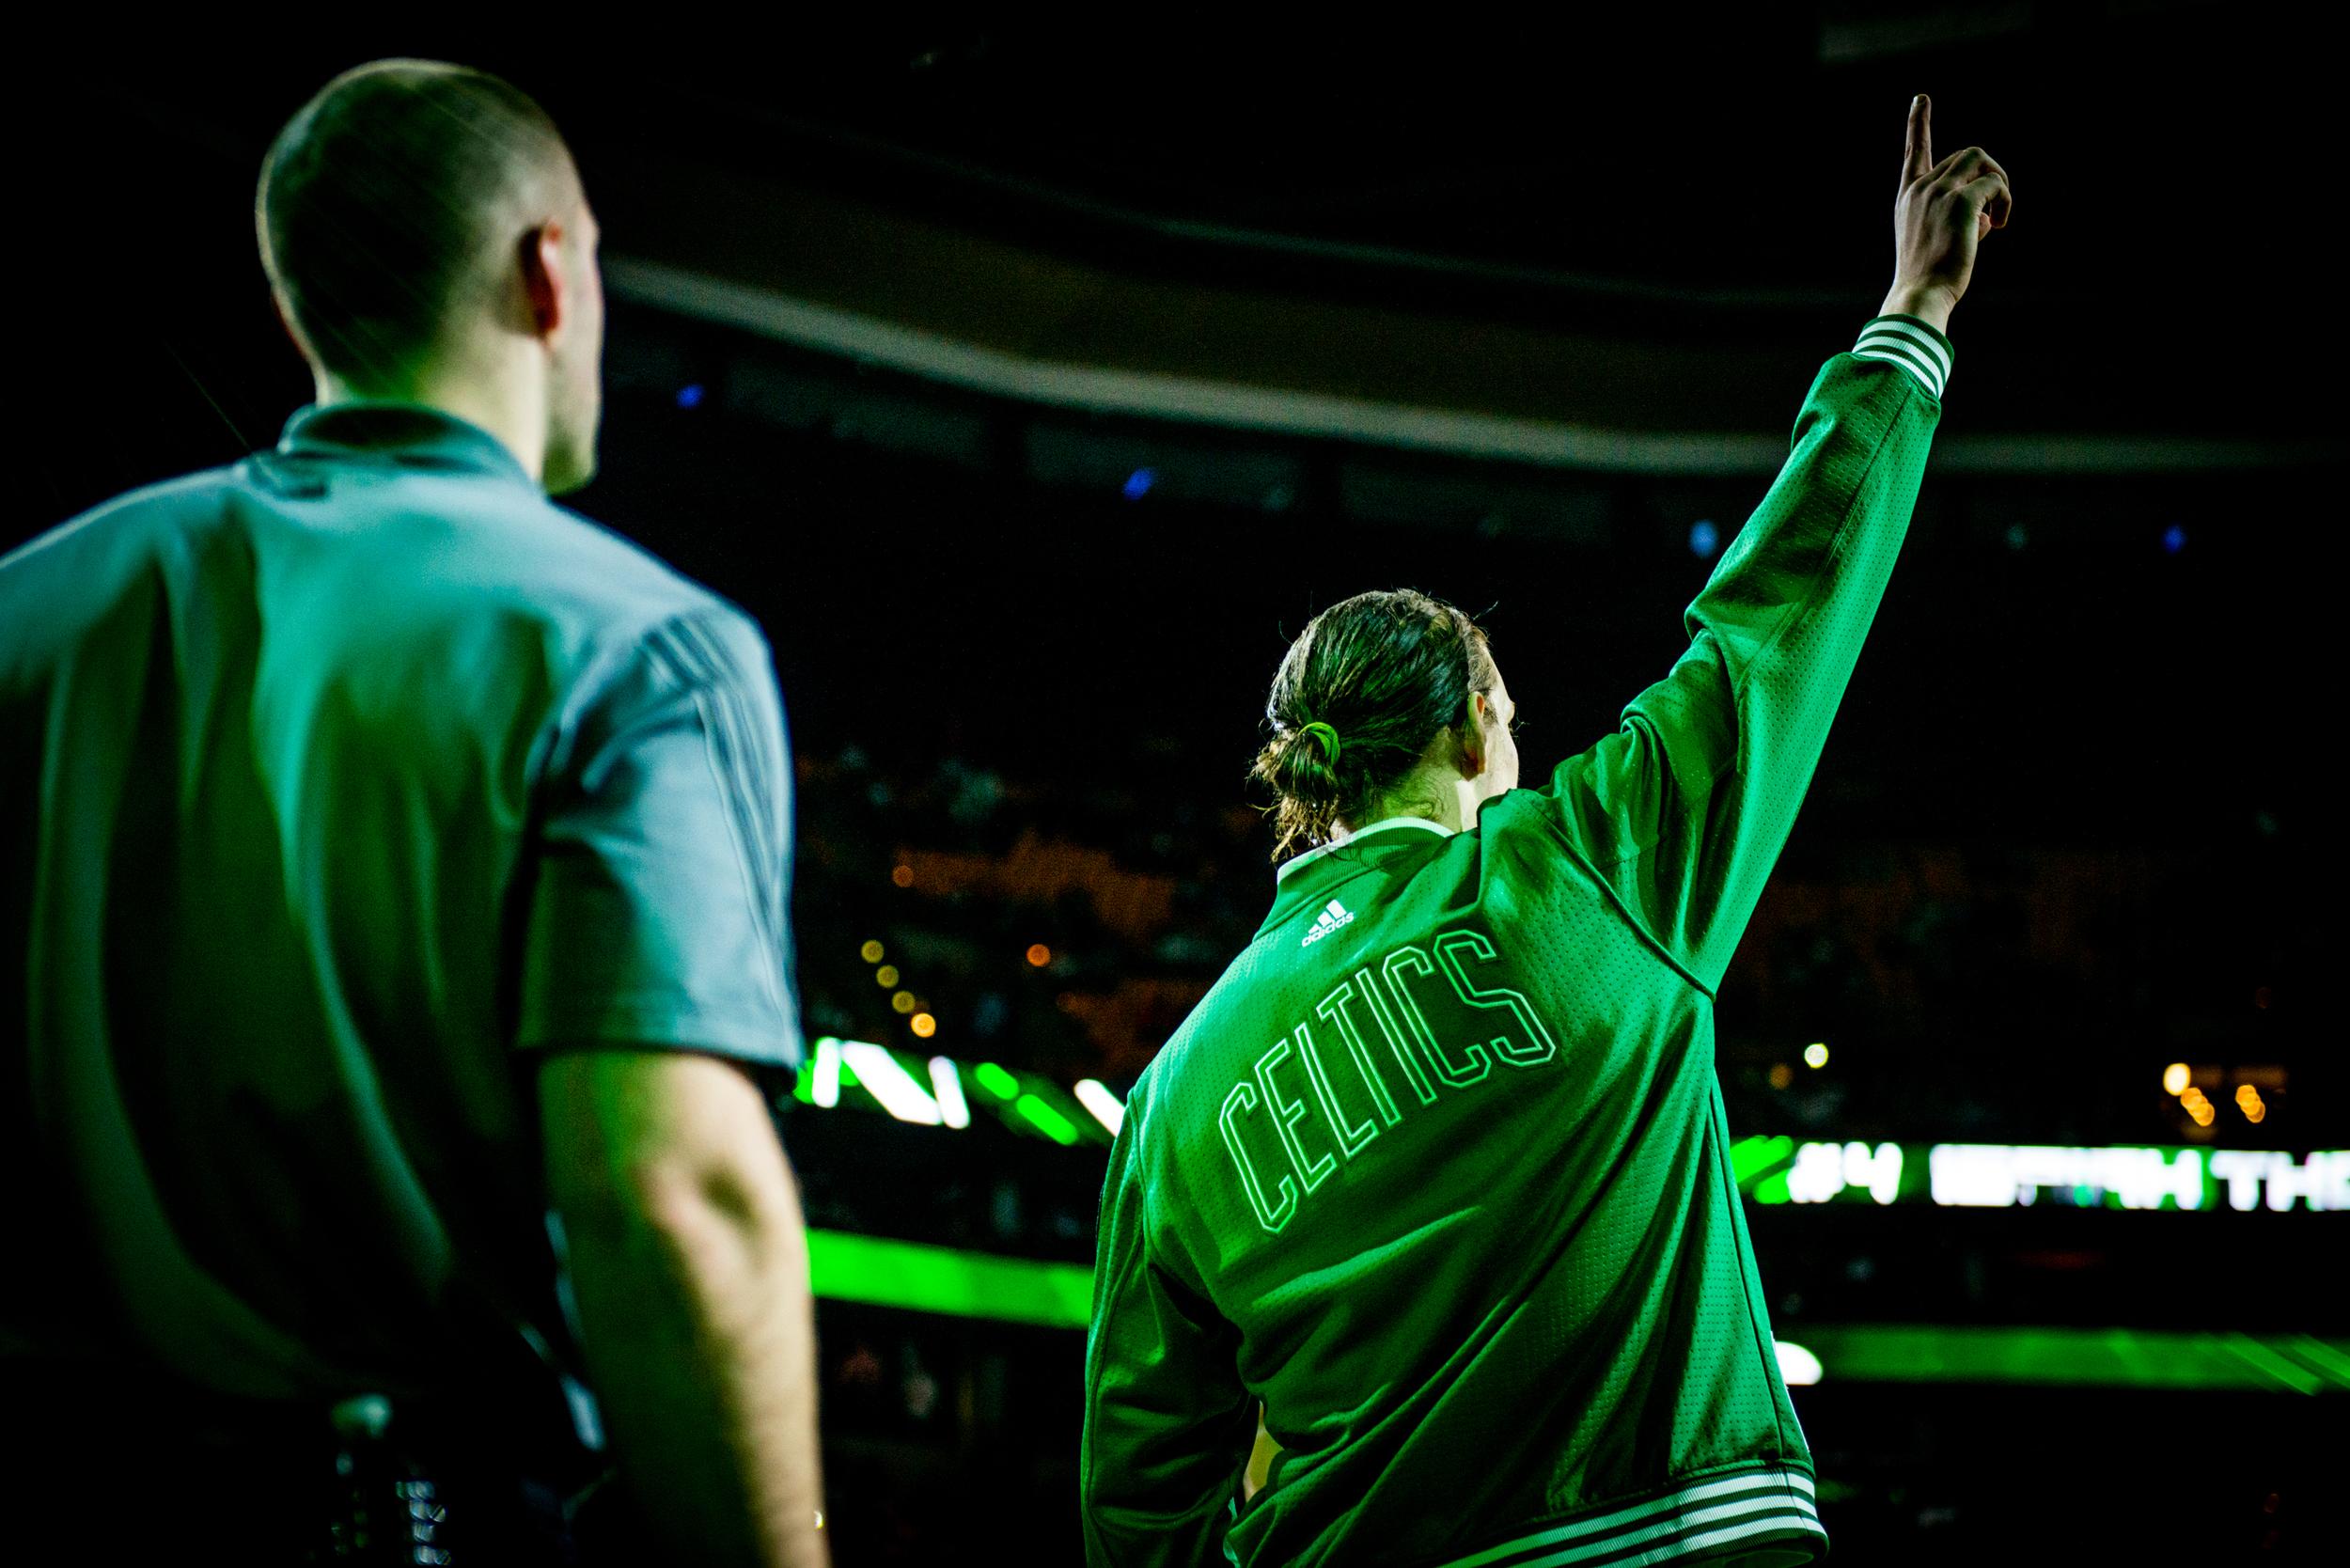 Celtics vs. Cavs